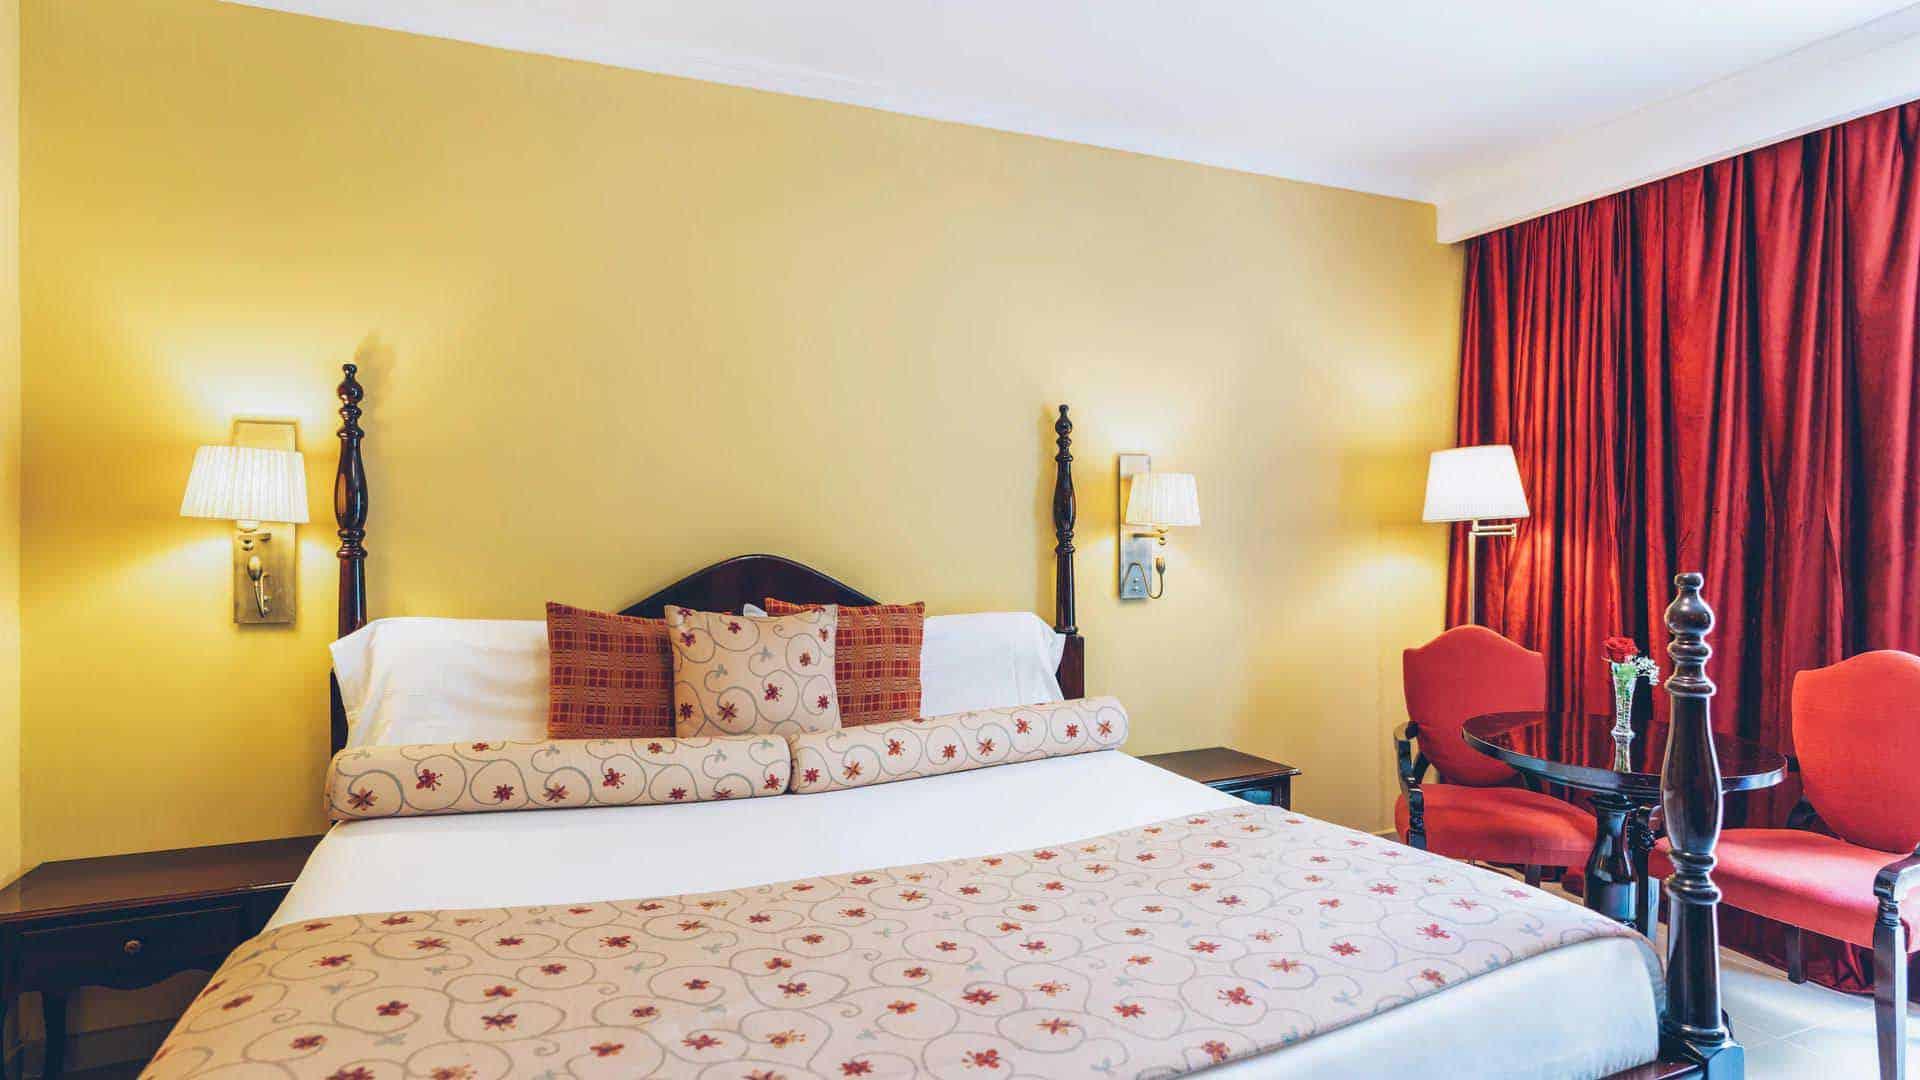 H0861 Hall Hotel Iberostar Trinidad 03 cuba autrement